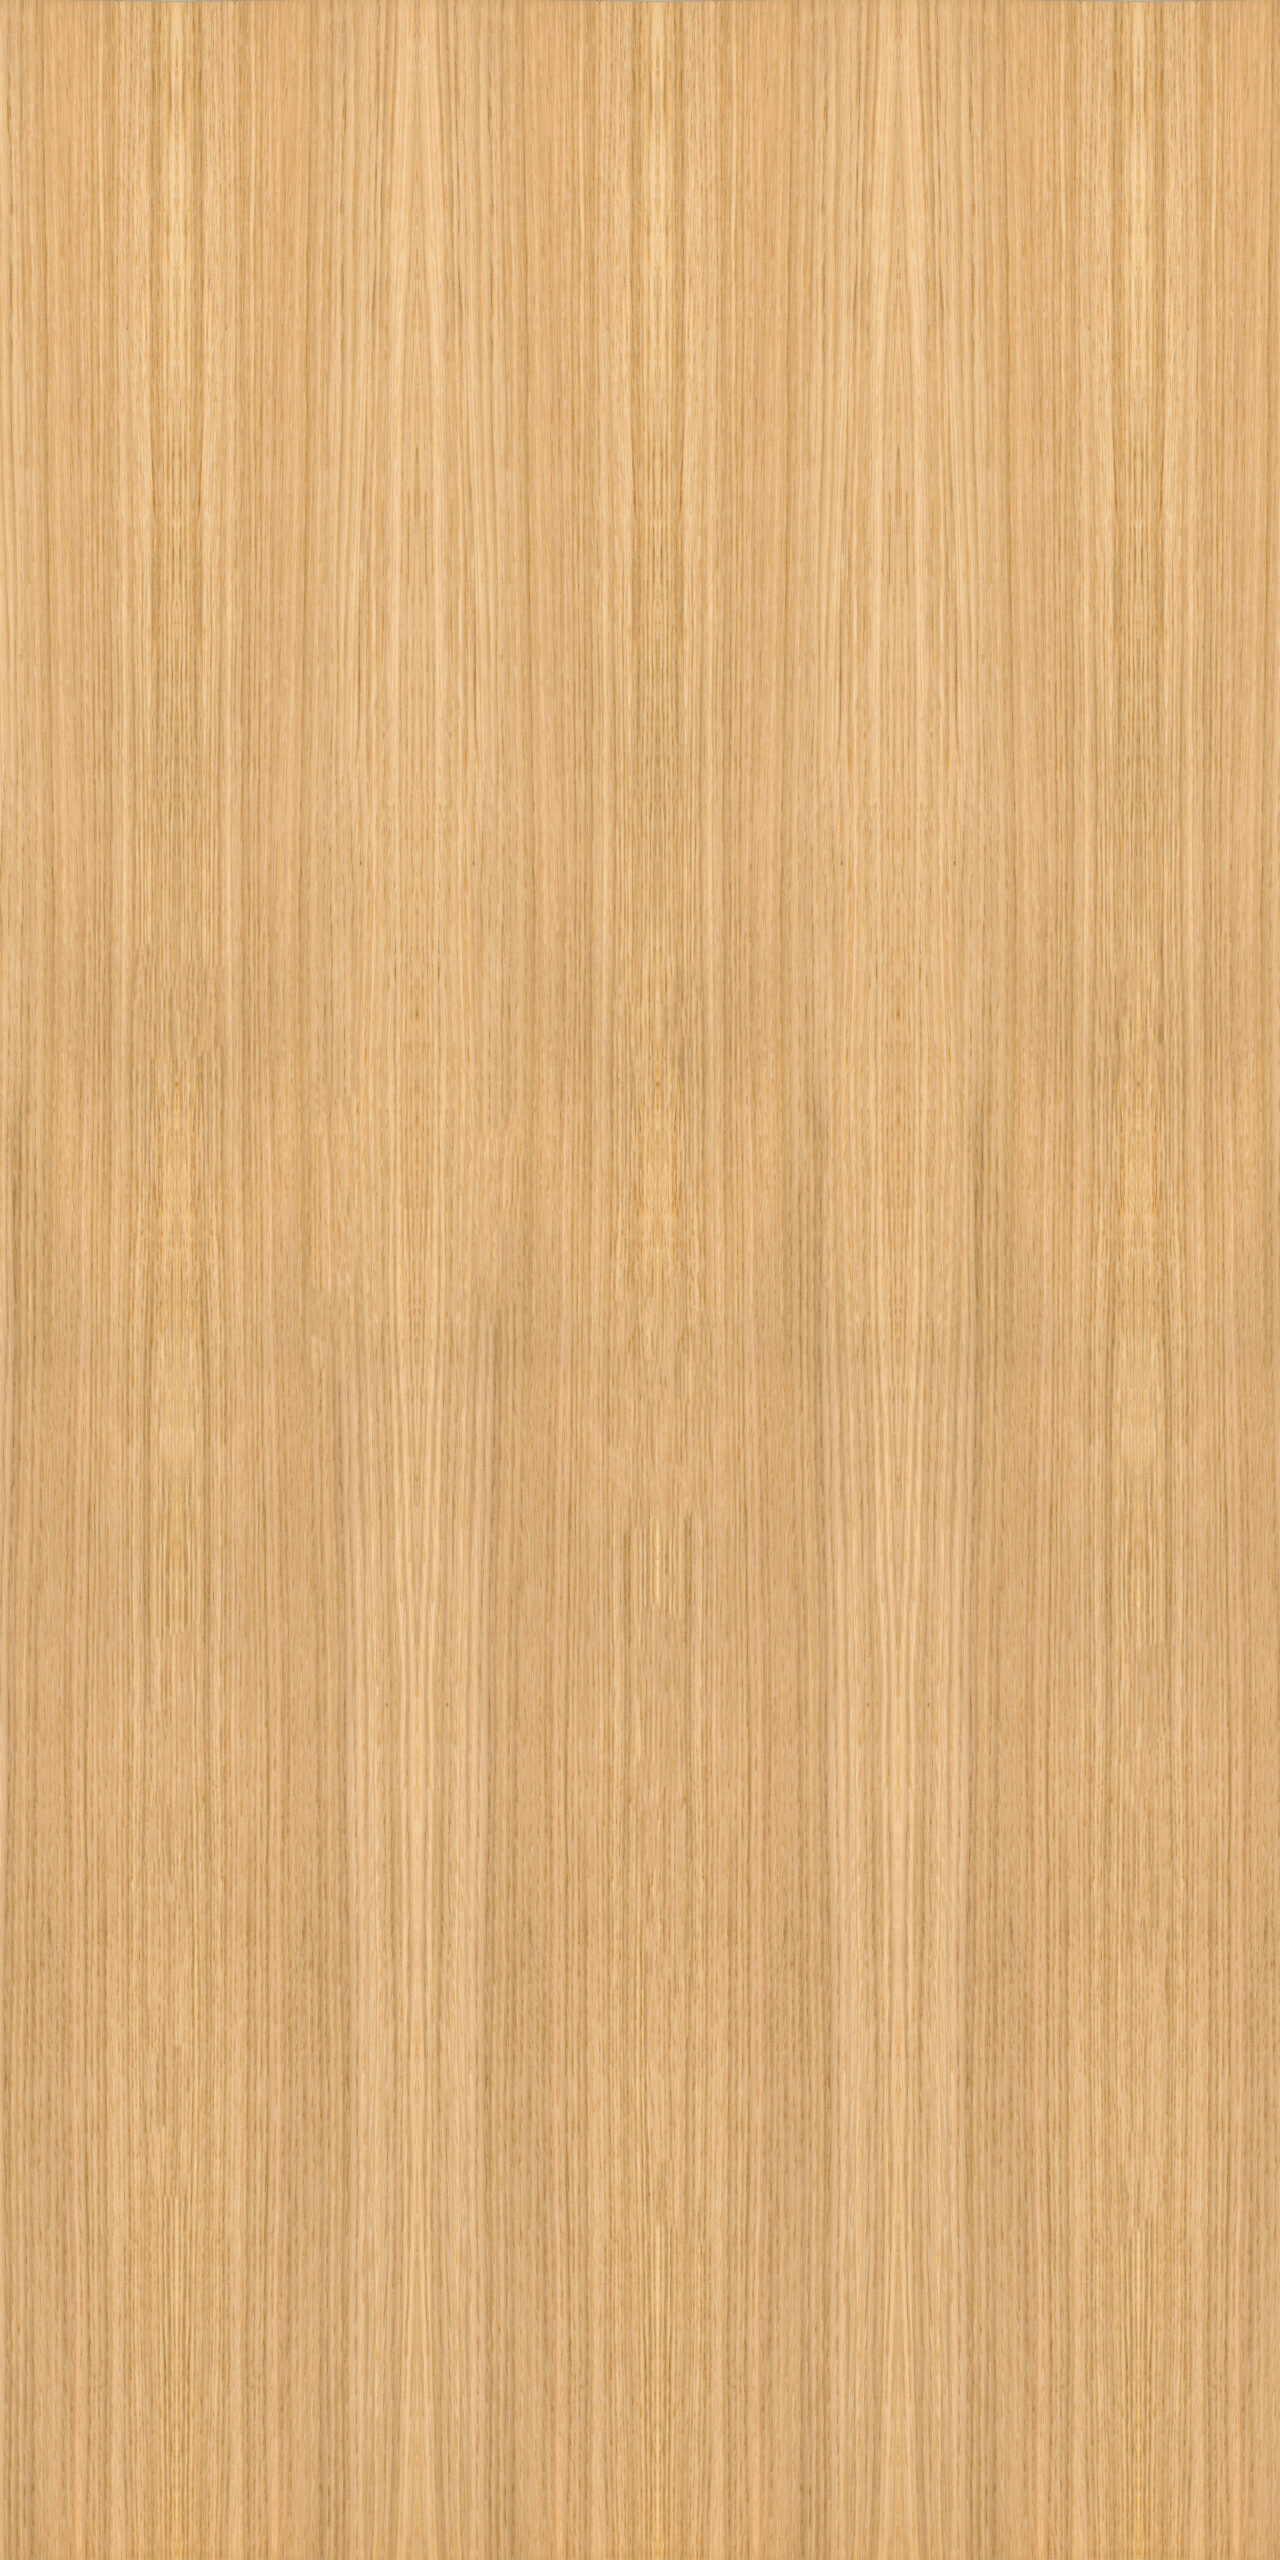 European Oak Quarter Cut Natural Veneer